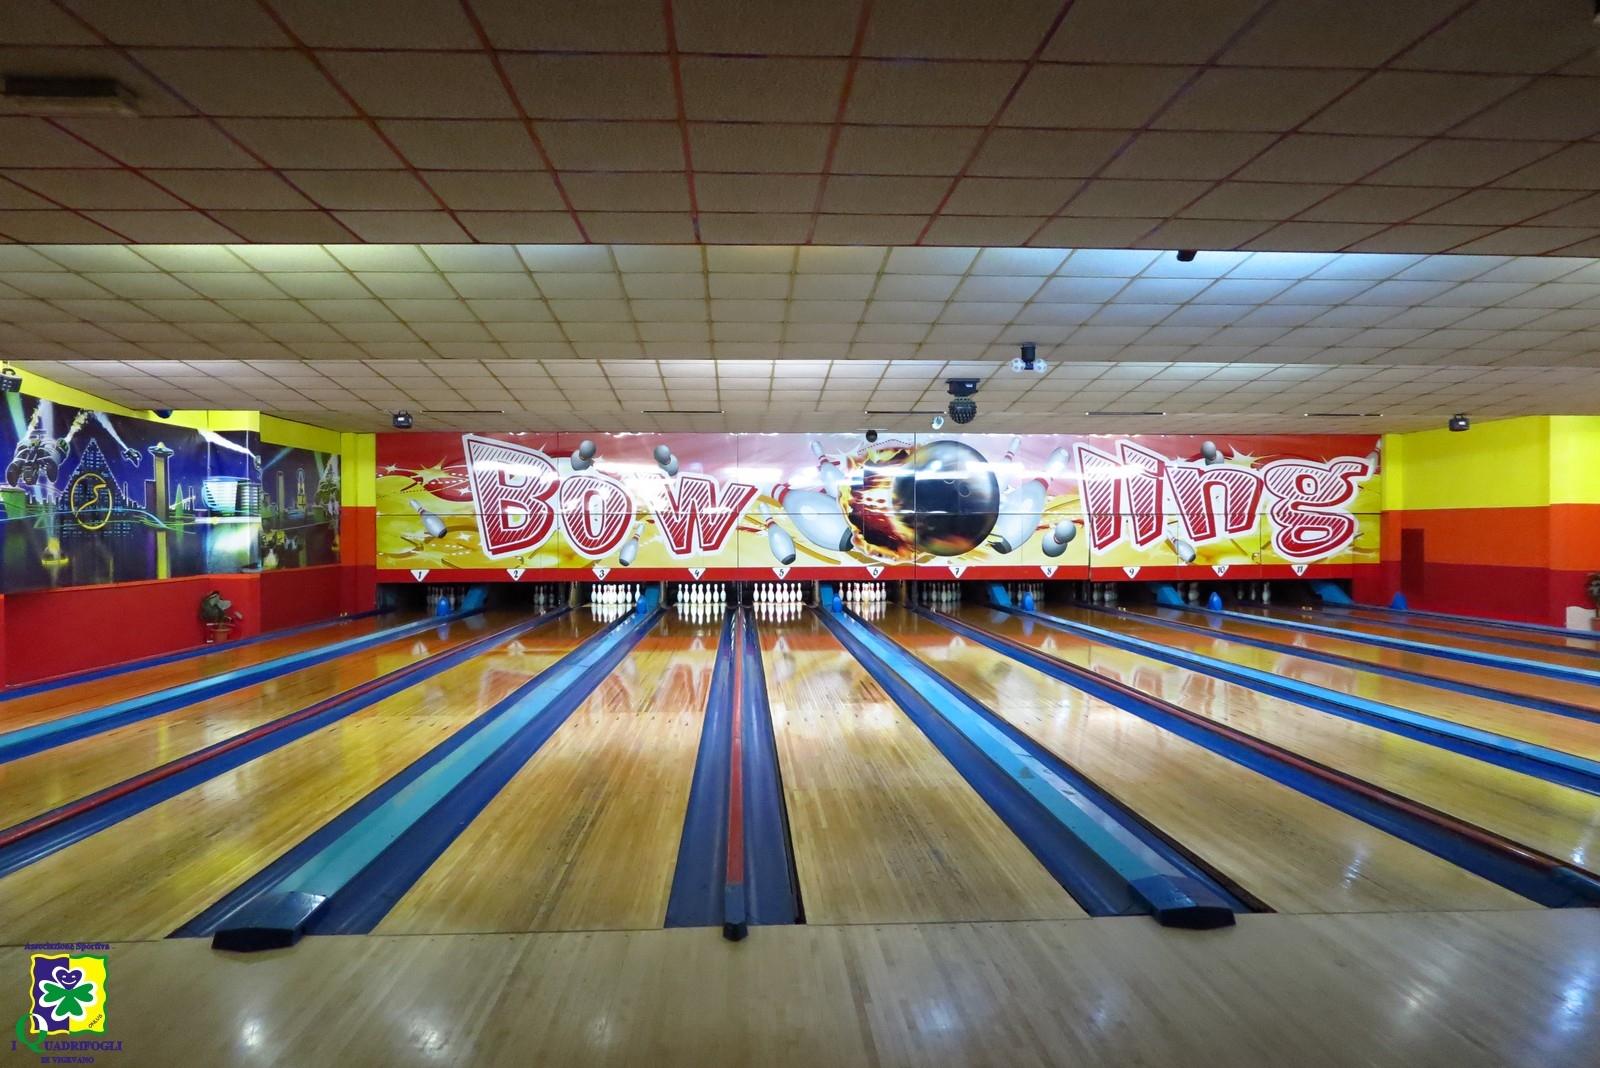 Torneo Bowling Vigevano 19-12-2018 - 001